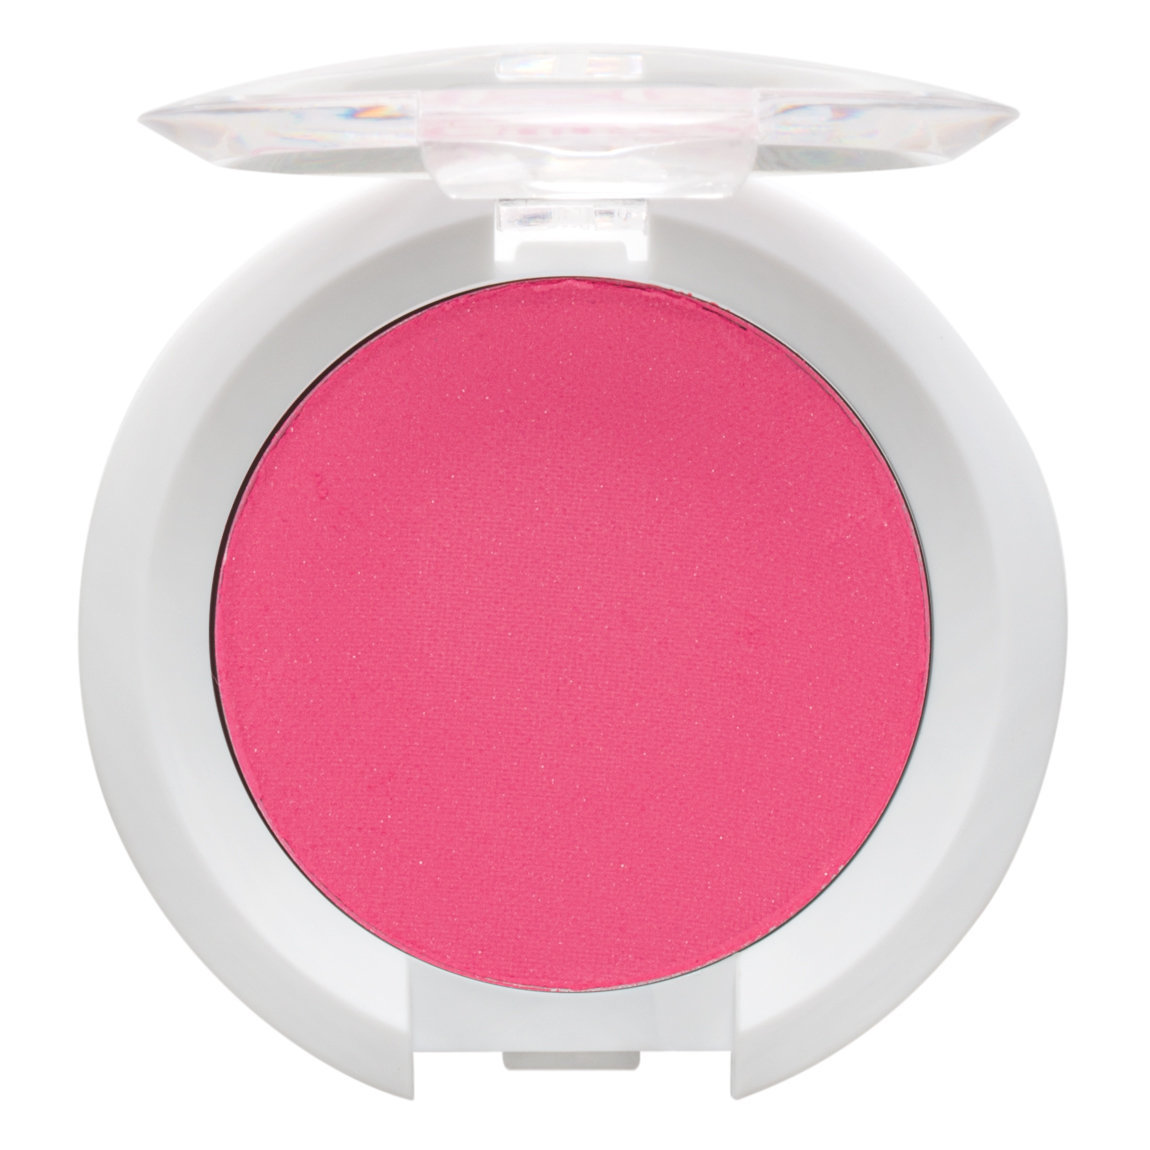 Sugarpill Cosmetics Pressed Eyeshadow Tokyo product swatch.